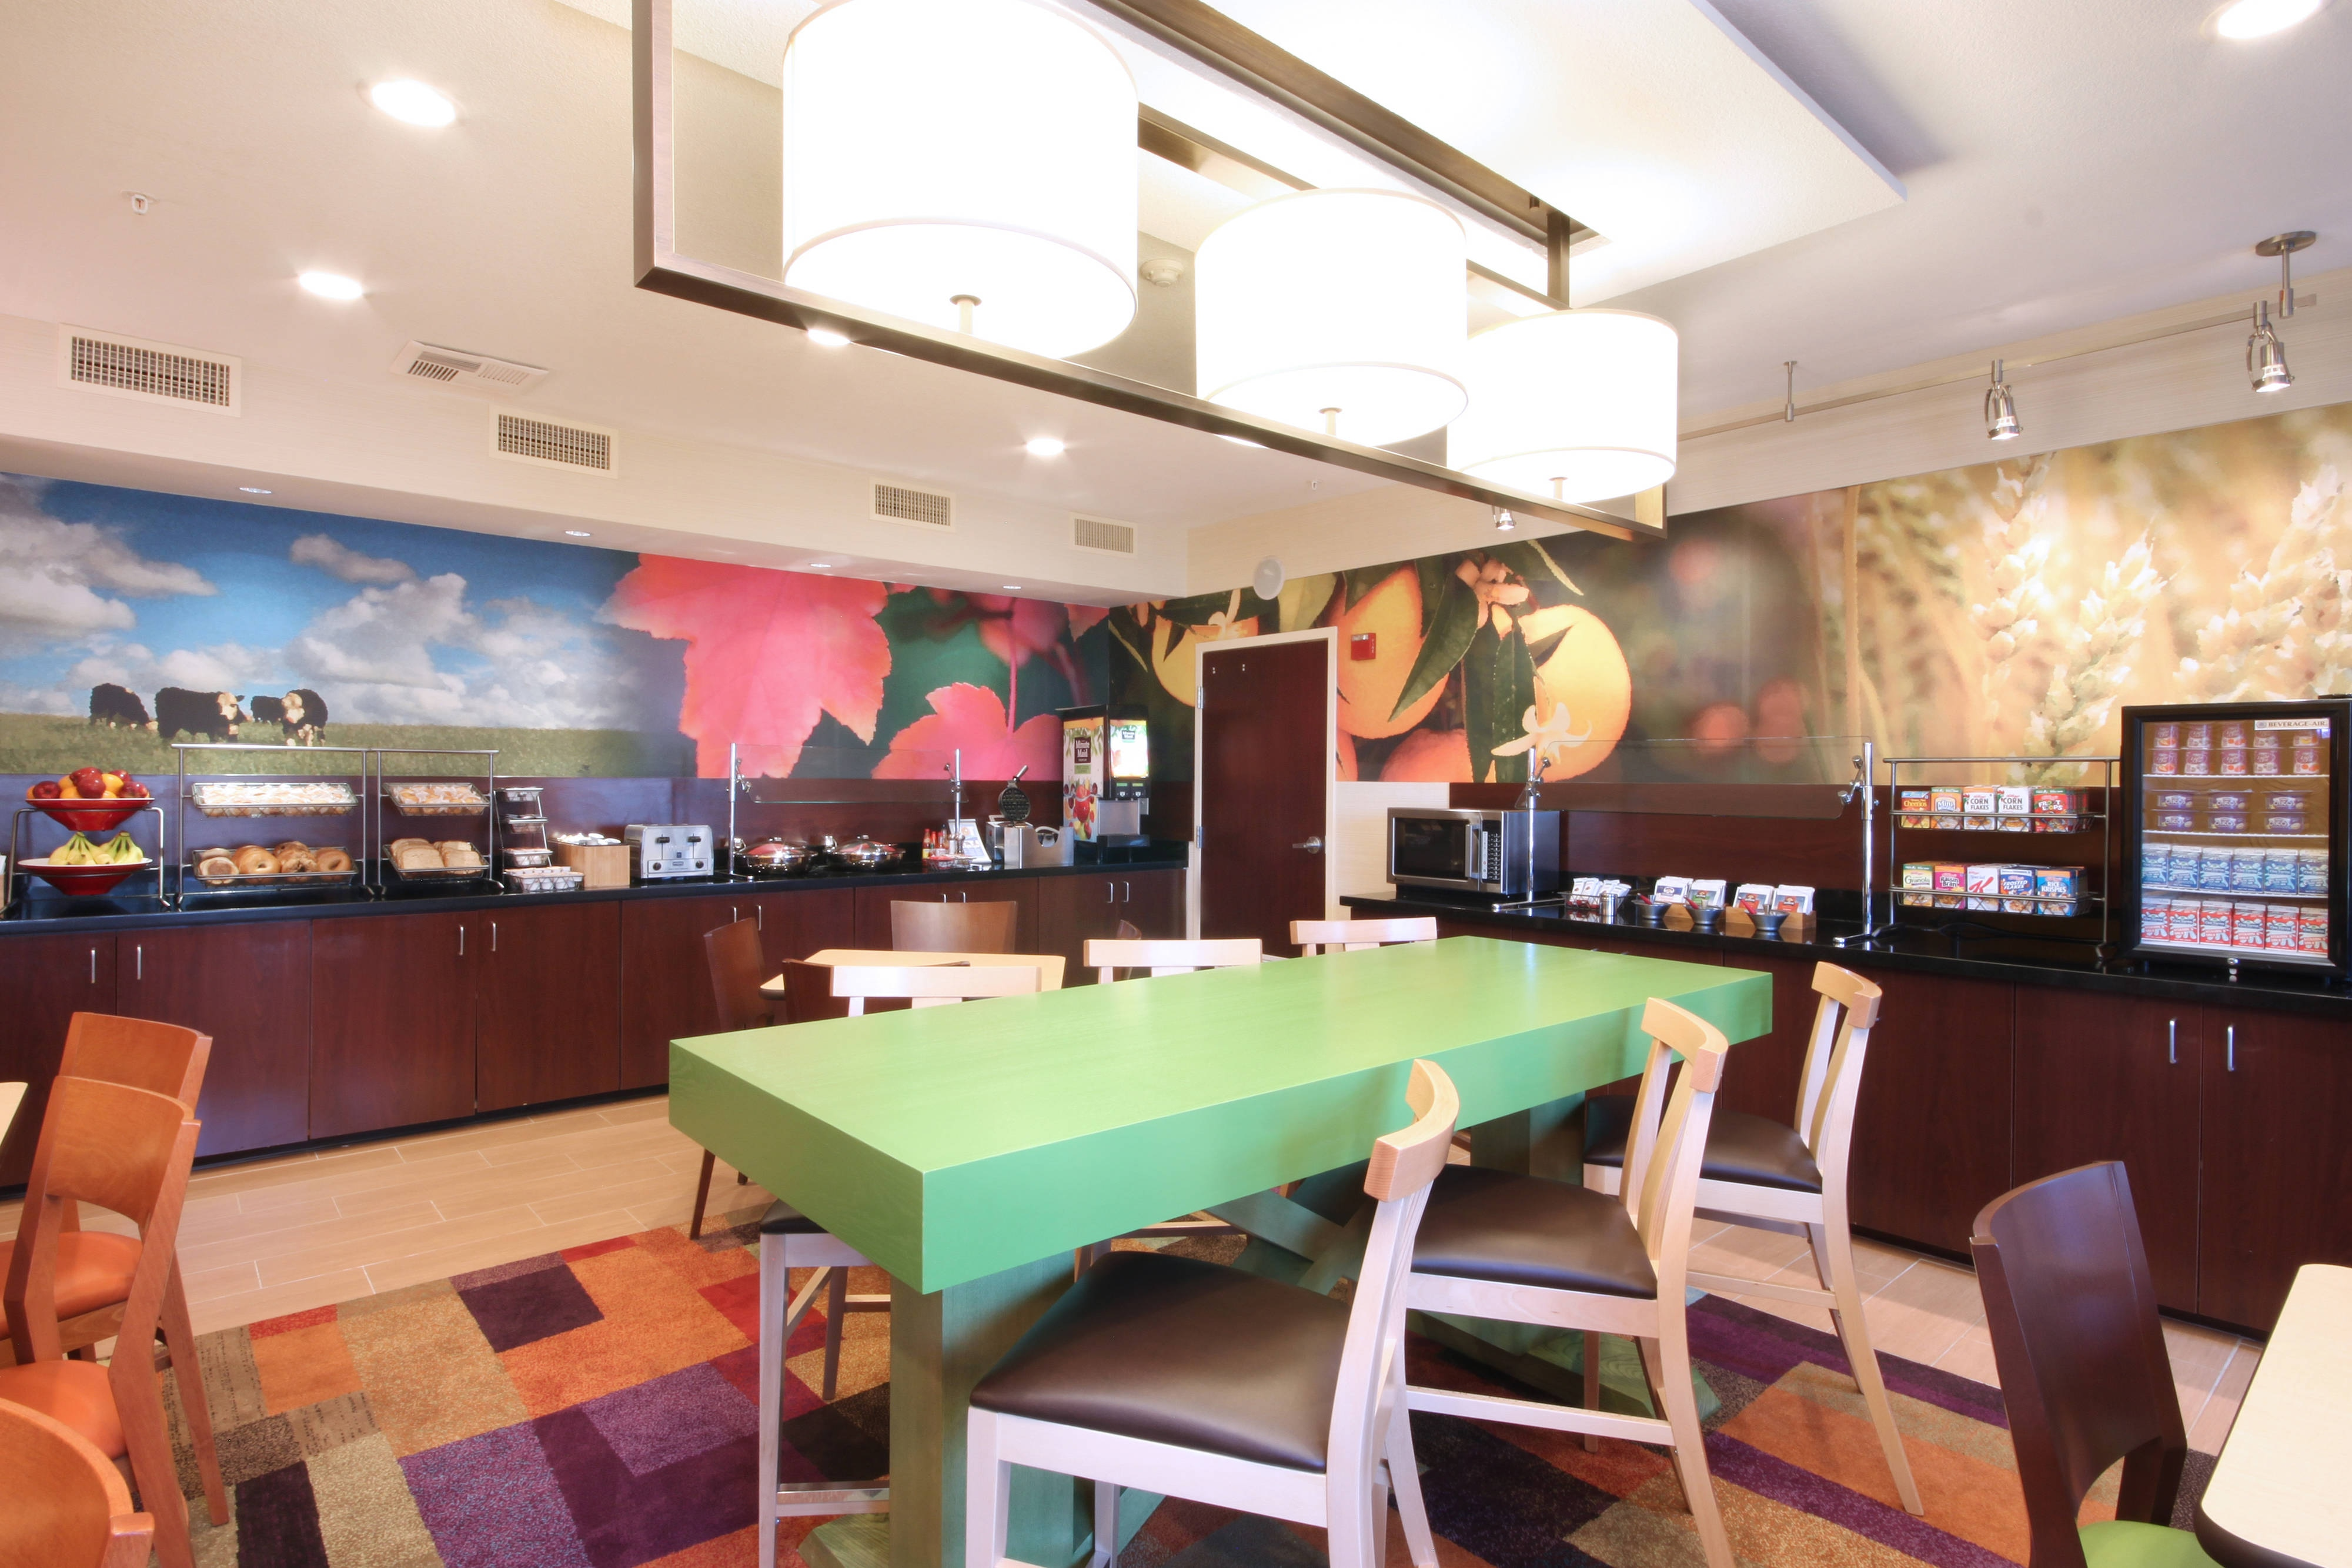 Fairfield Inn & Suites Dallas Las Colinas Breakfast